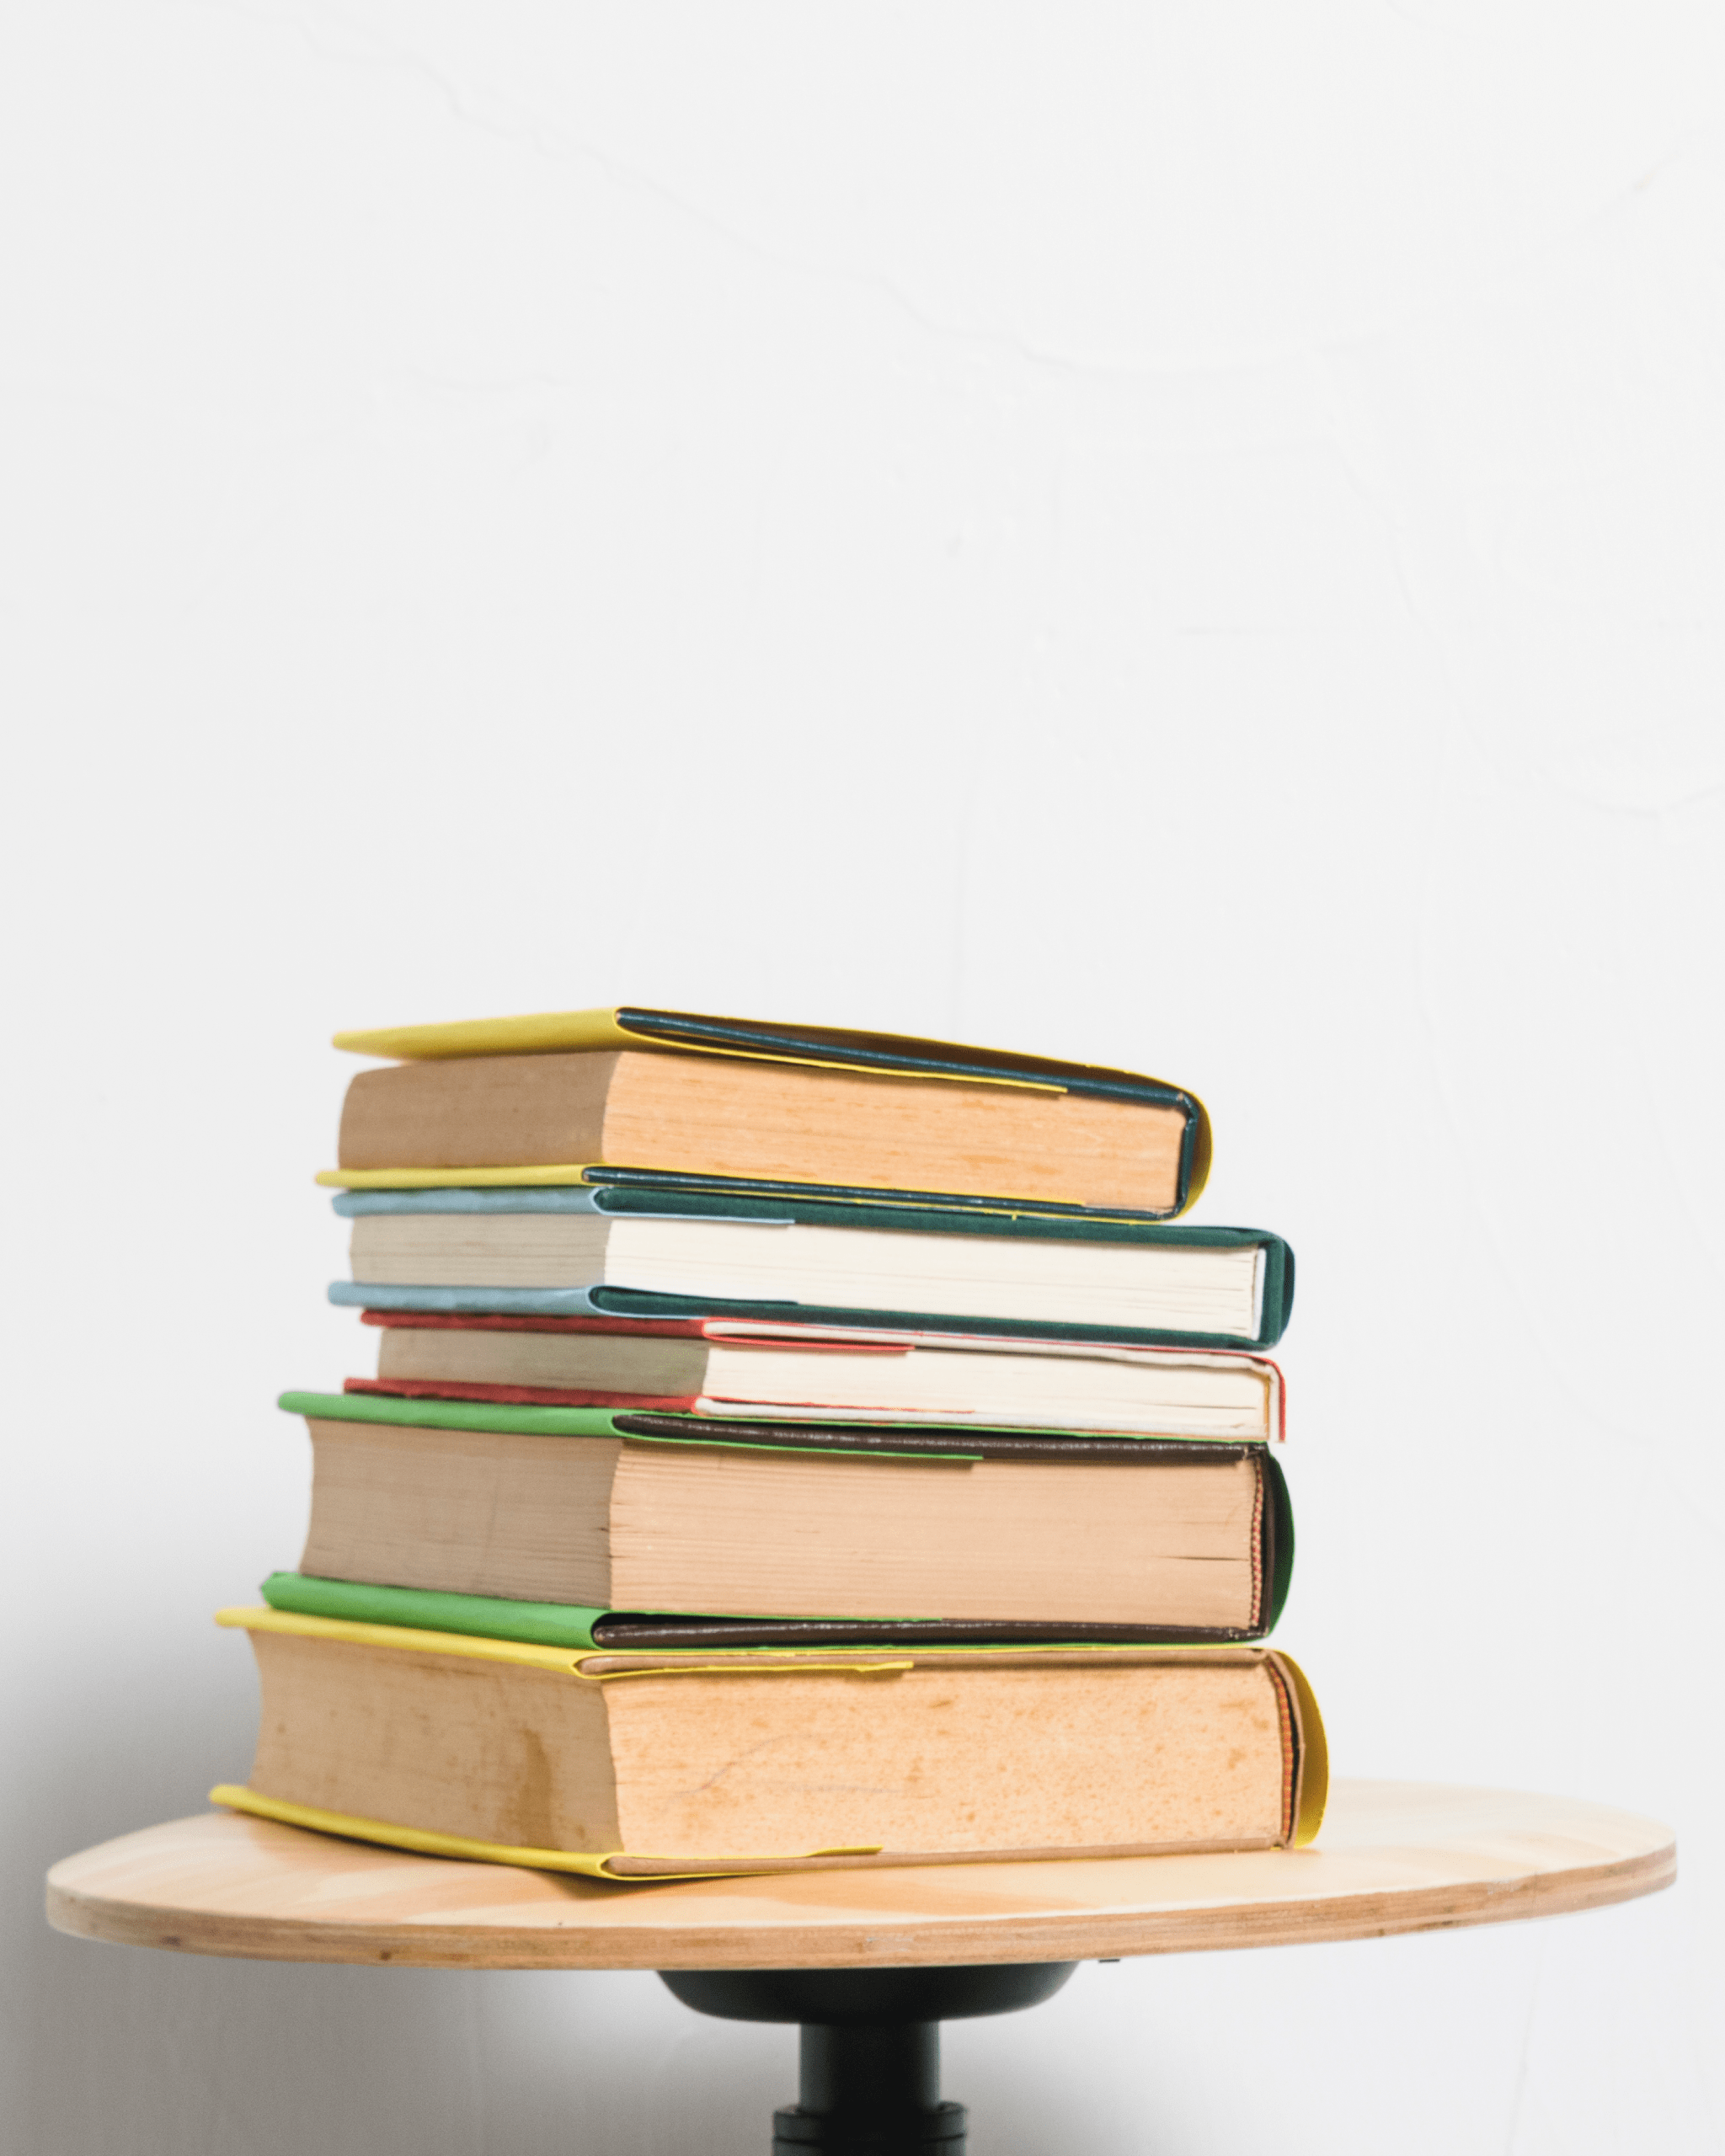 Pile of hardback book